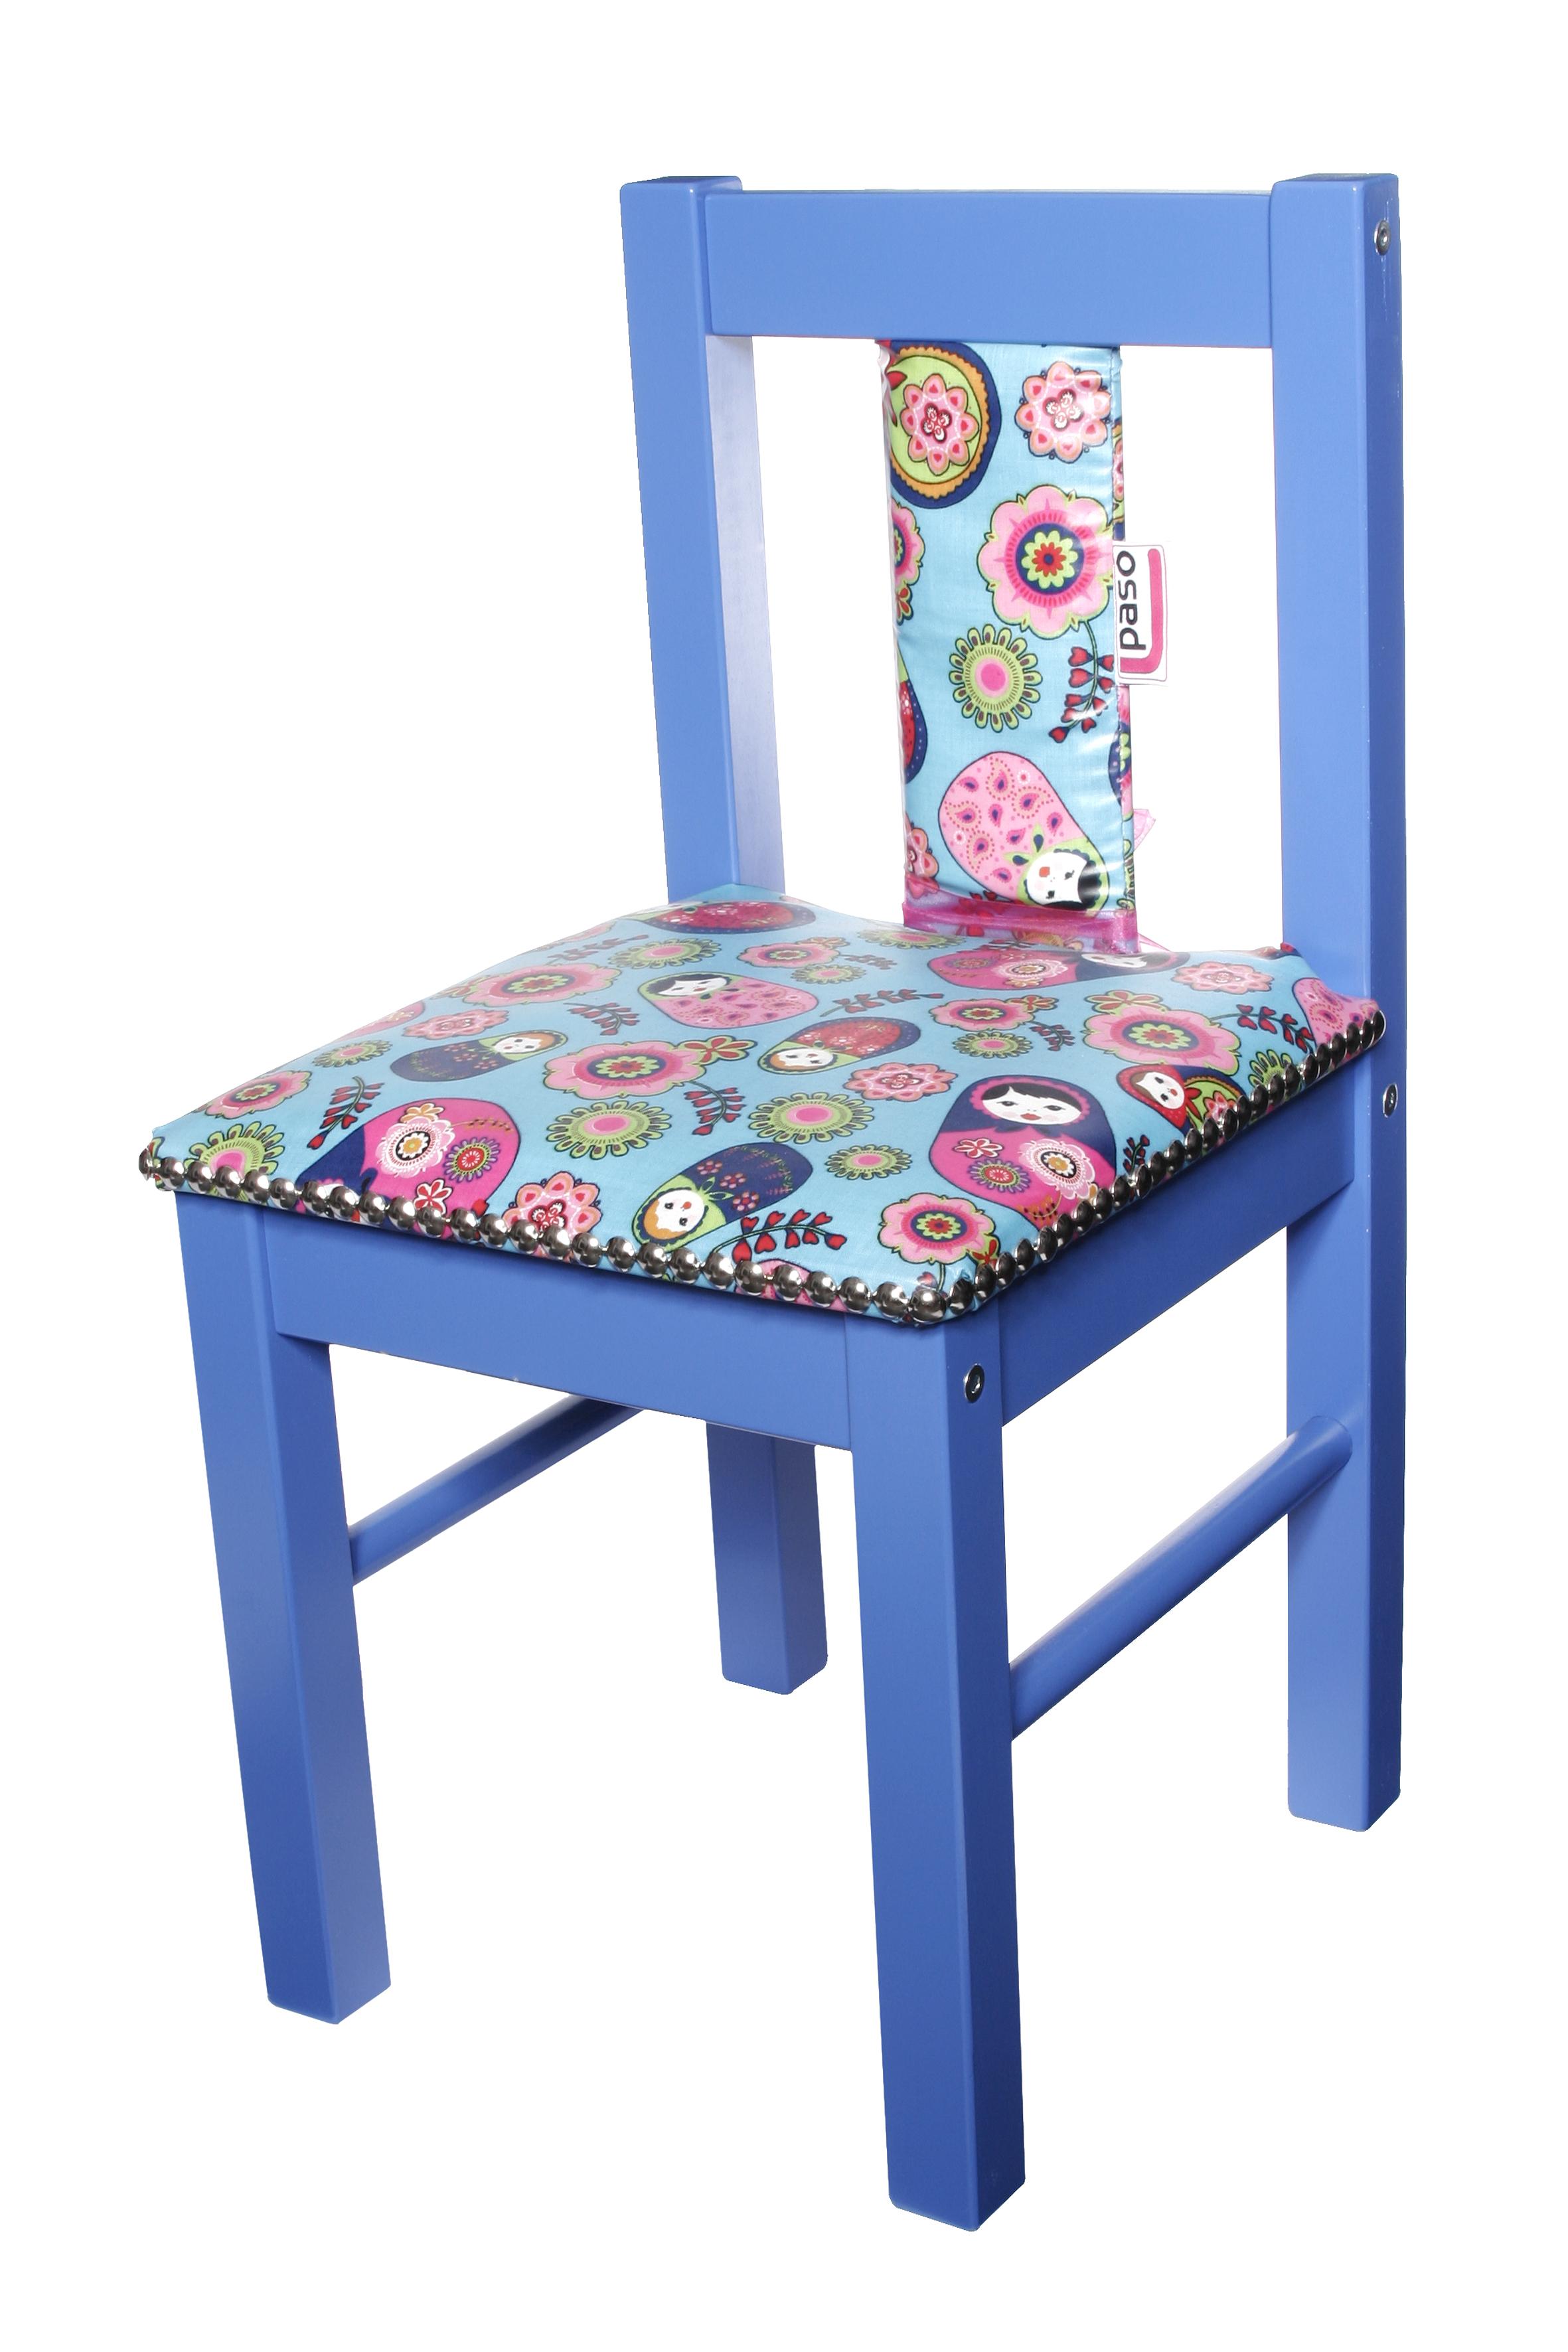 stoel_blauw_1.jpg